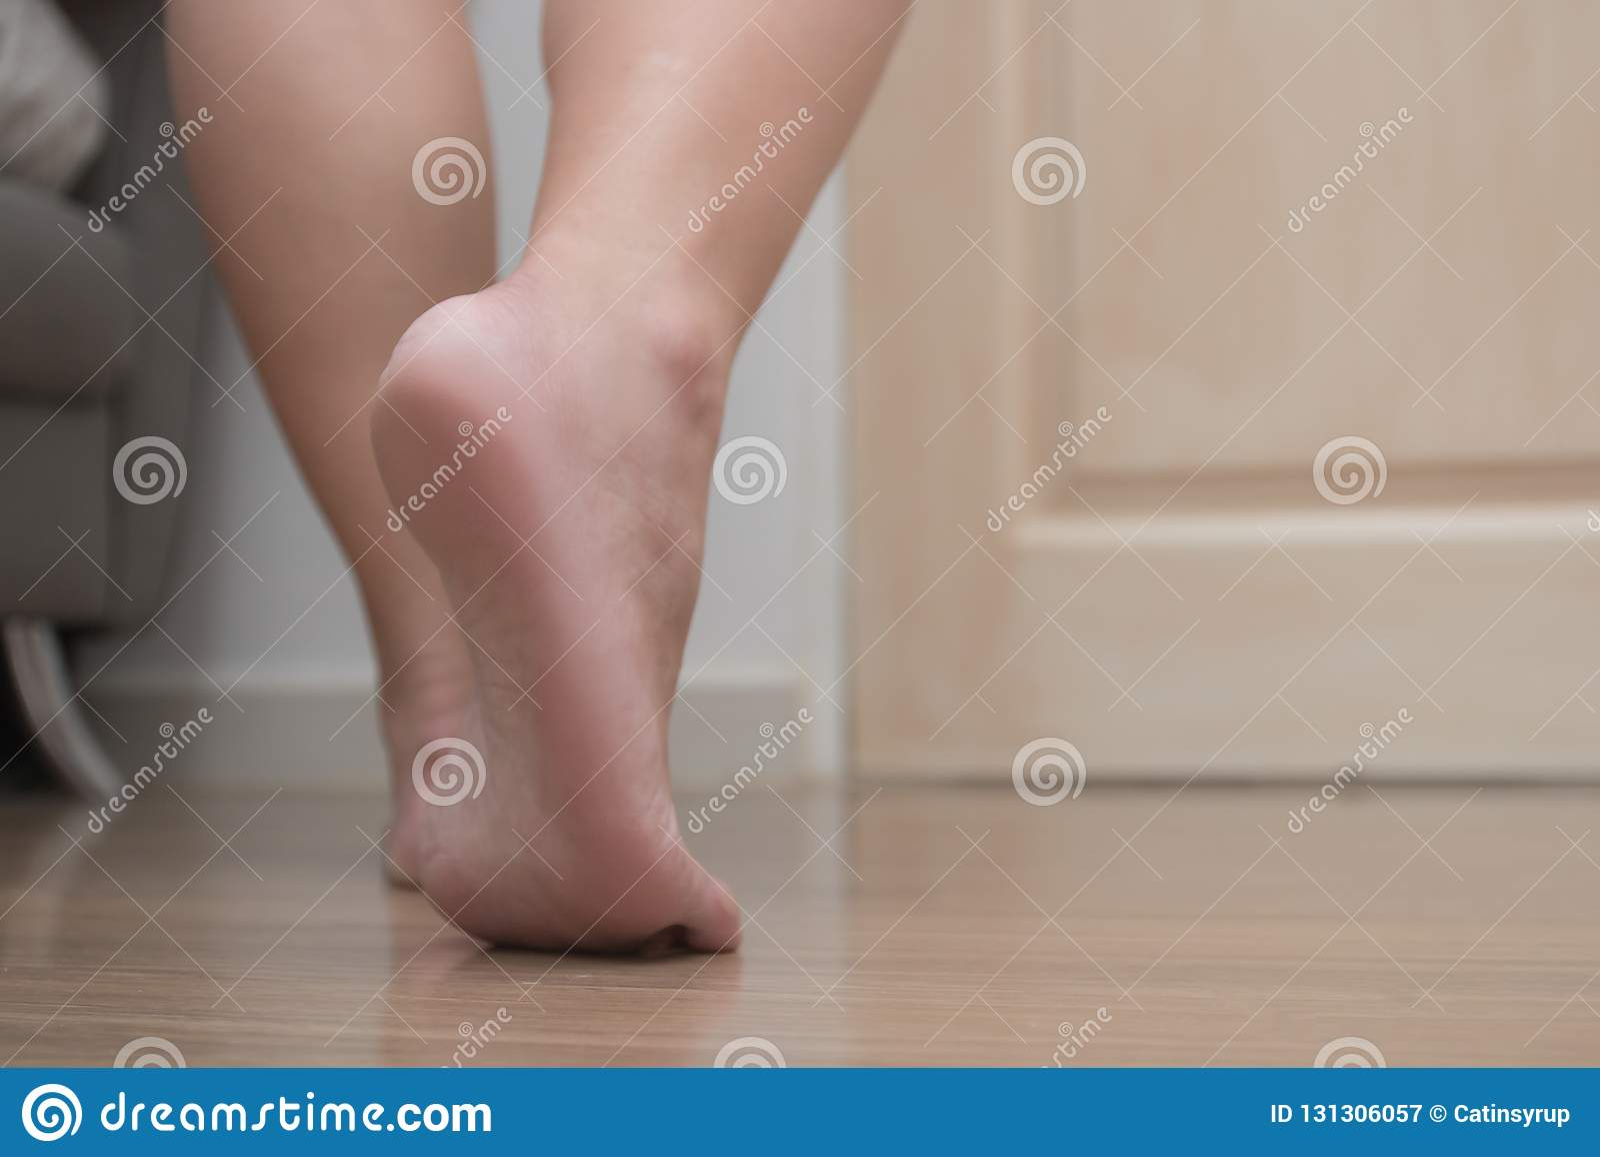 Ступни ног фото крупным планом — img 3